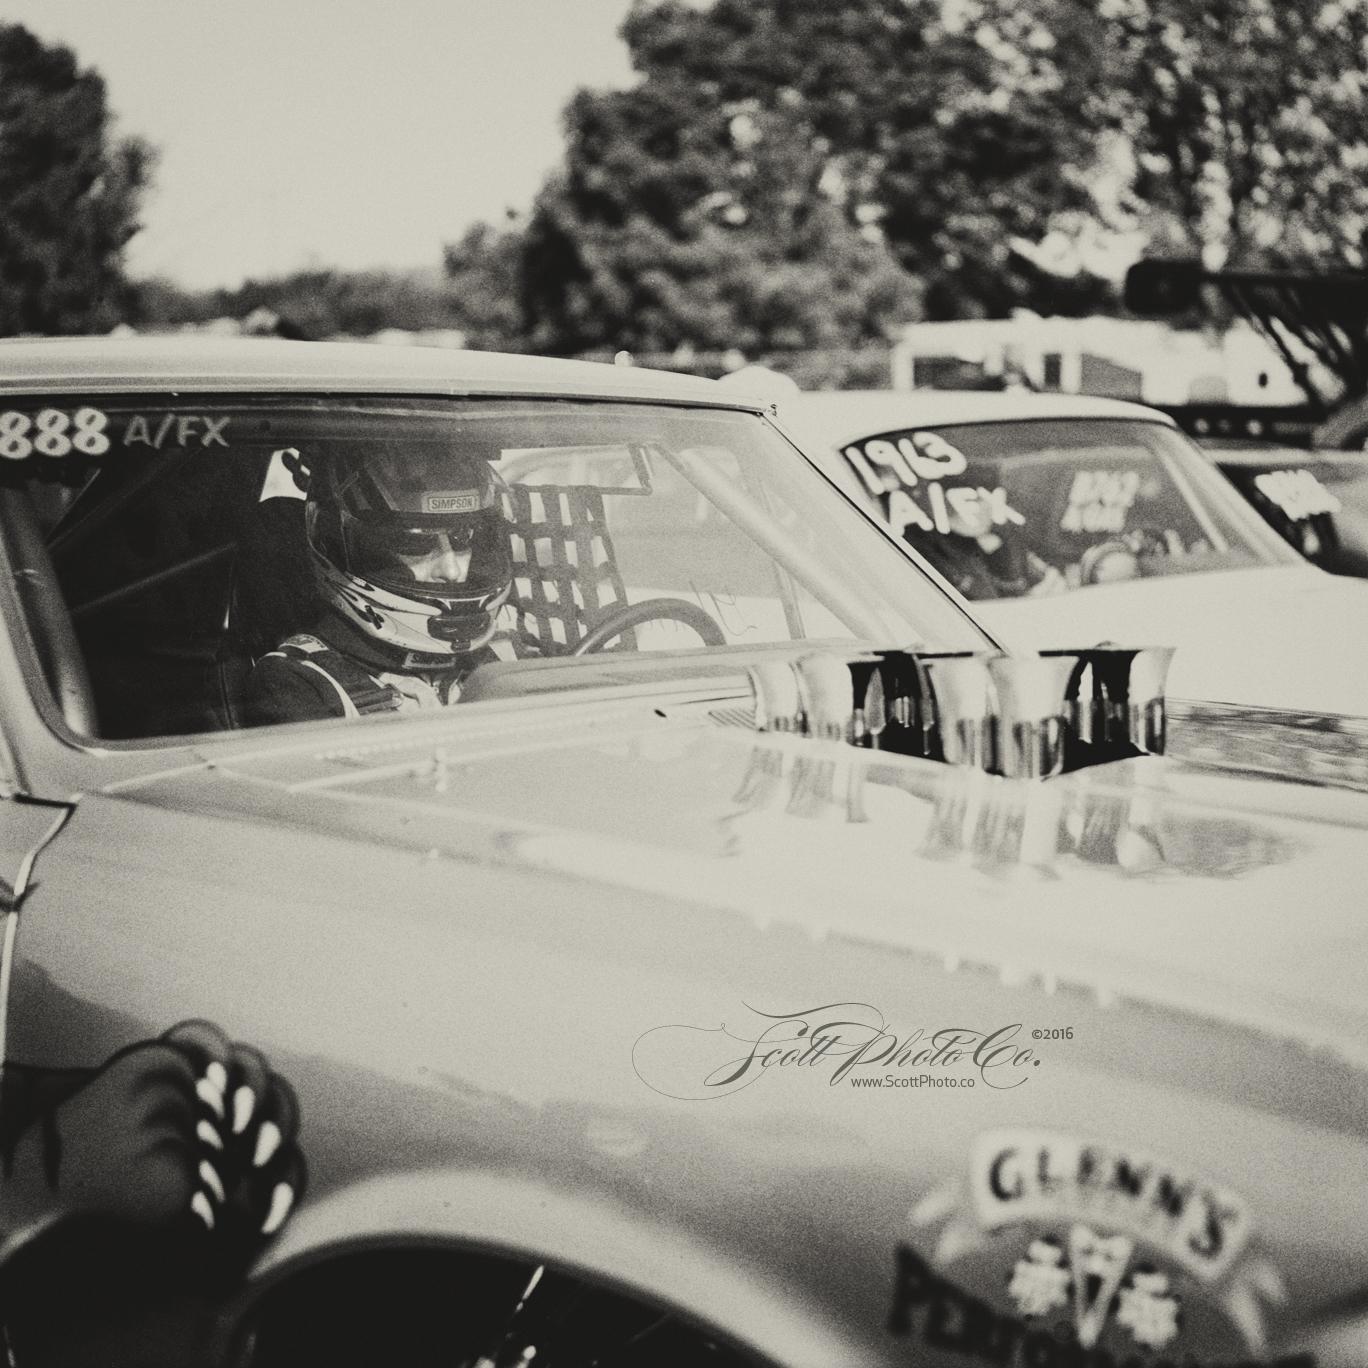 HRR_2014_ScottPhotoCo_Drivers_15_SPC.jpg